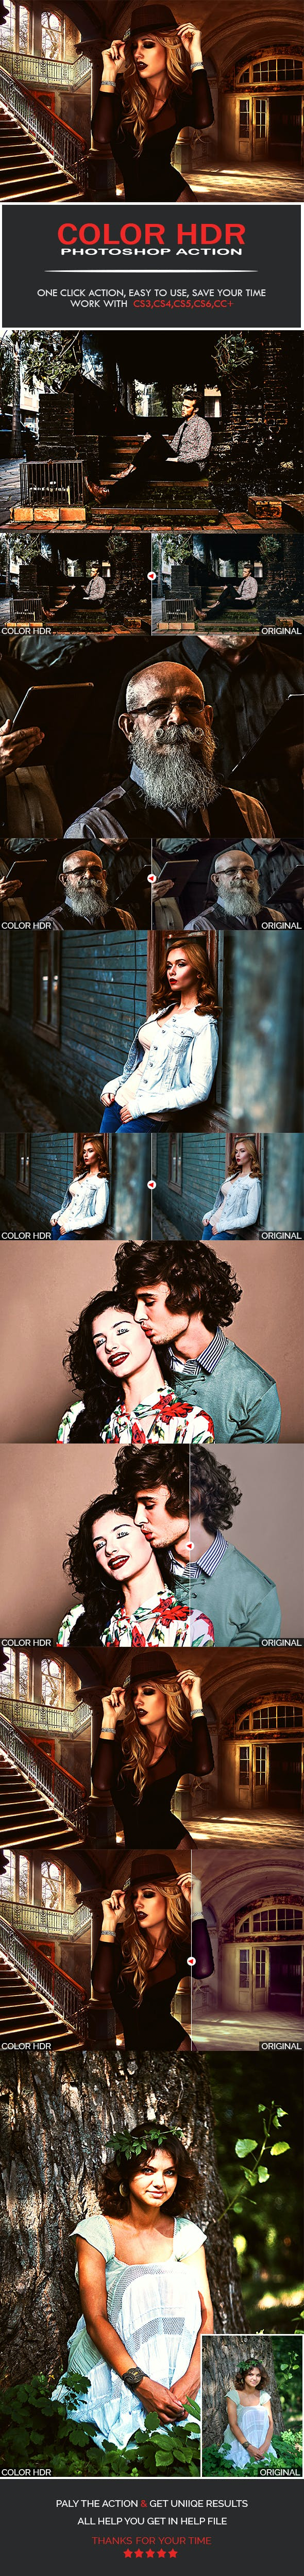 Color HDR Photoshop Action